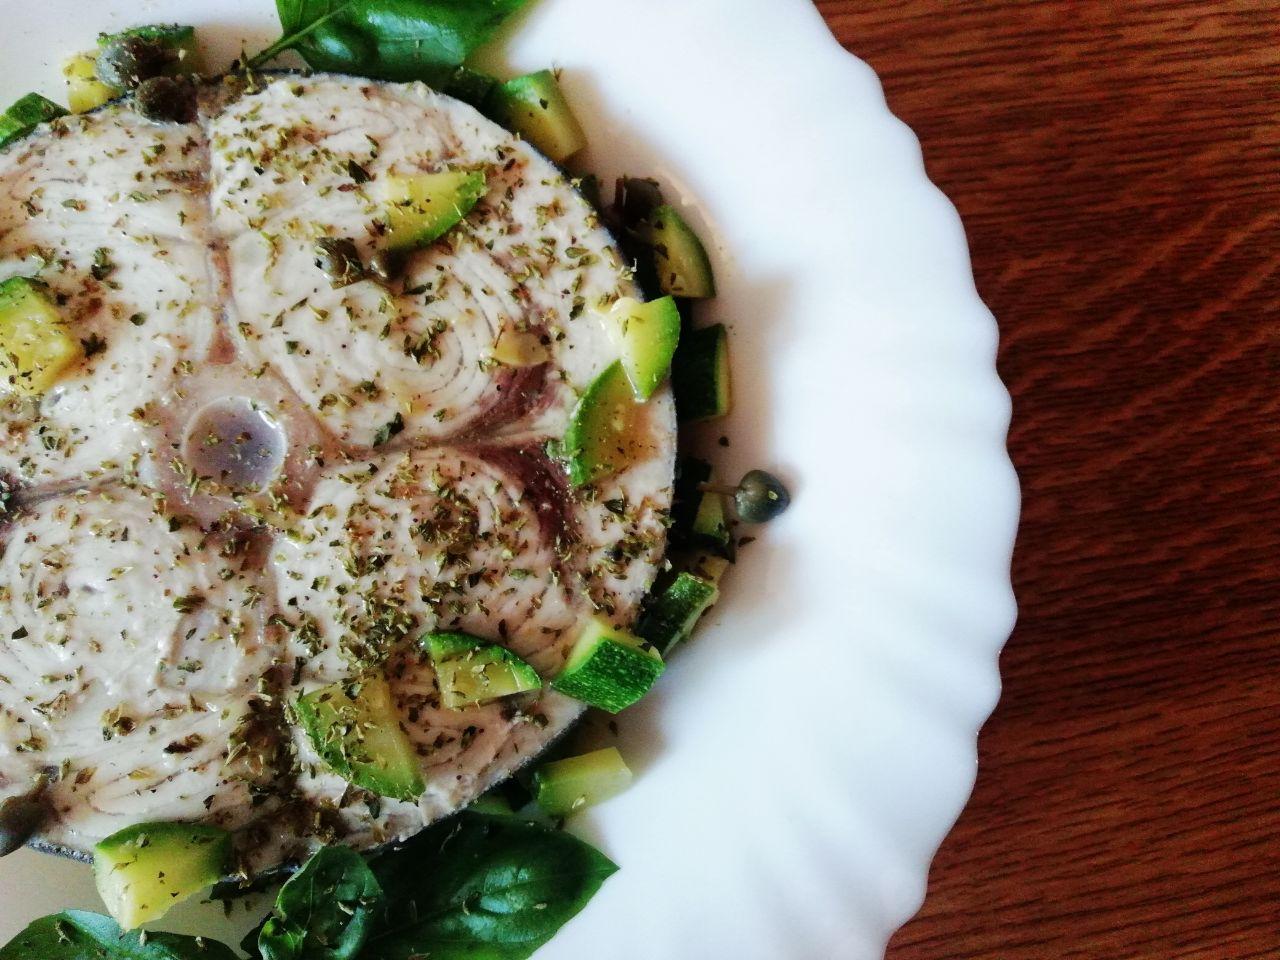 Secondi piatti a base di pesce: pesce spada con capperi e zucchine!